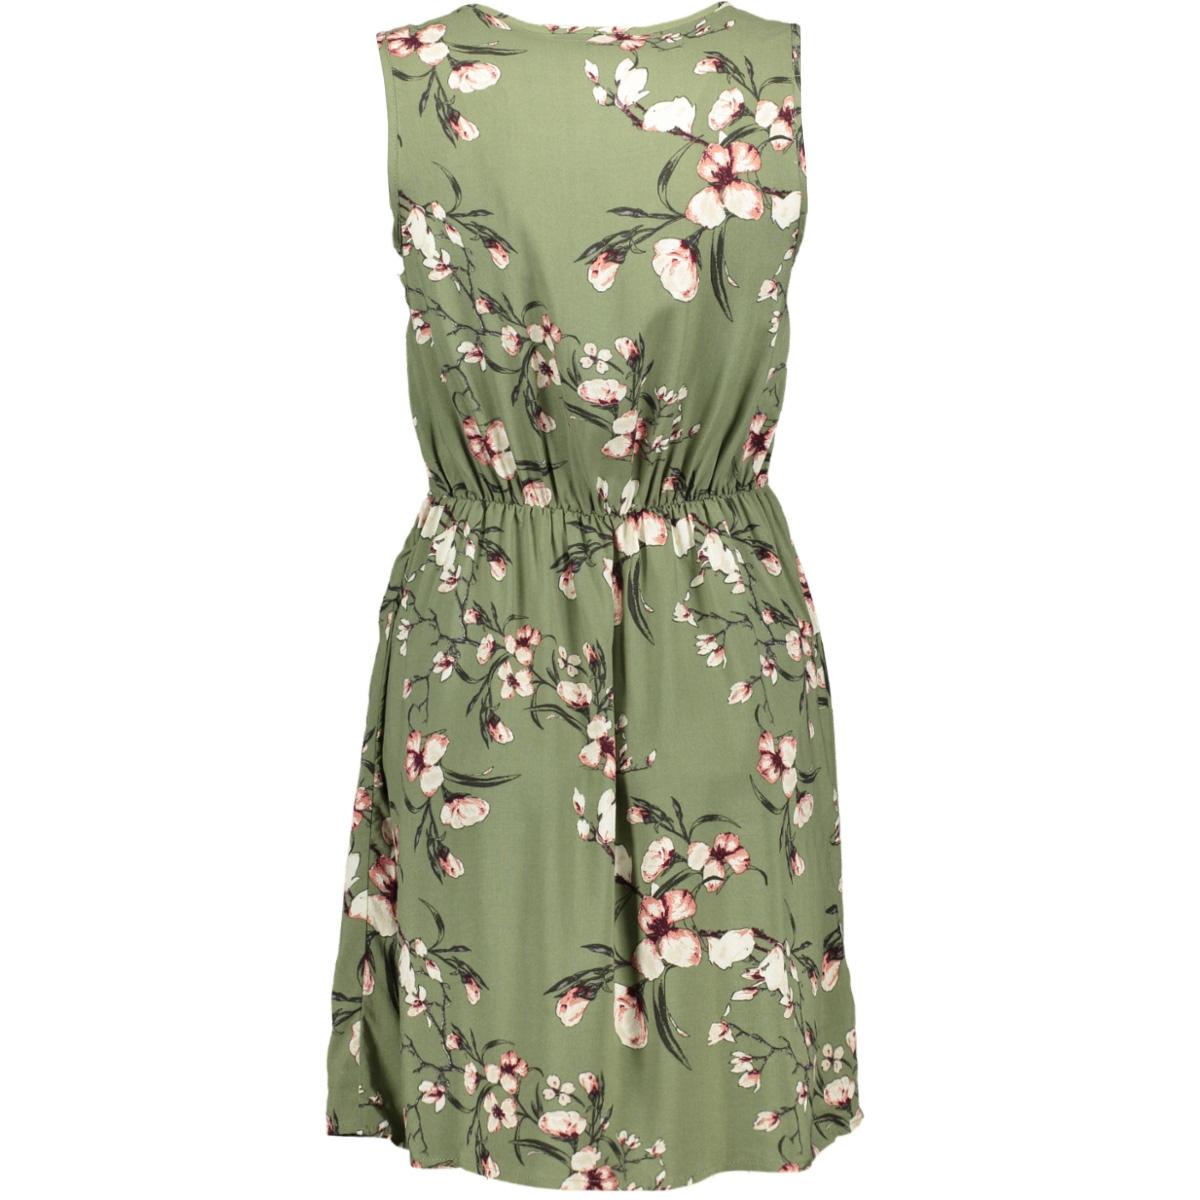 vmsimply easy sl short dress 10211484 vero moda jurk oil green/laura - oi